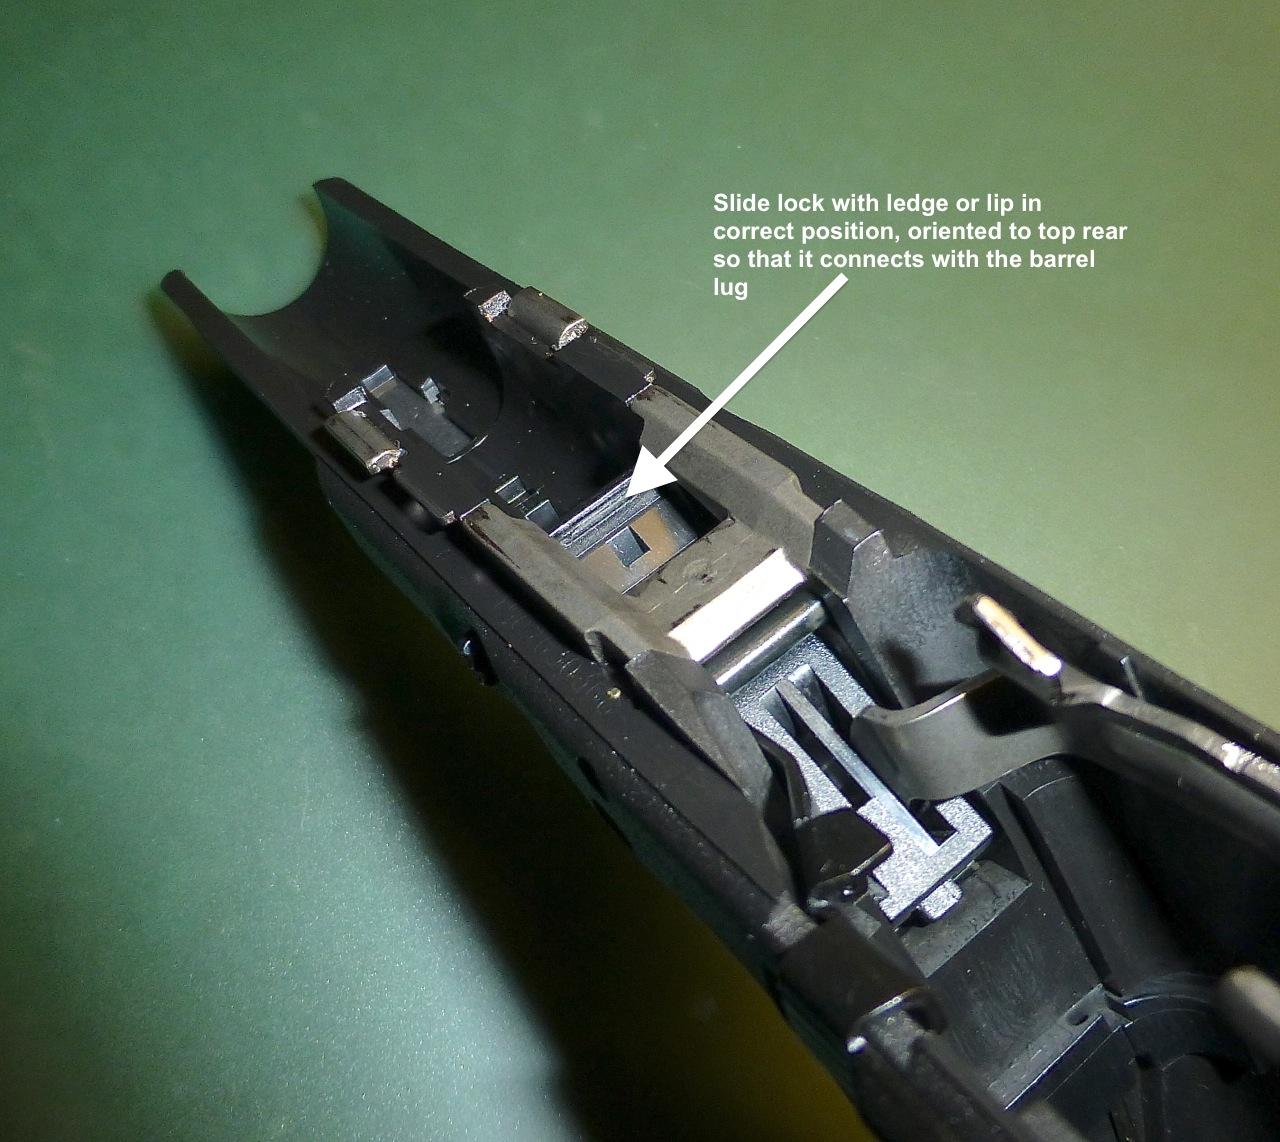 Stupid Glock Mistake Parts Diagram 5517d1380237141 Weird Problem 30 Slide